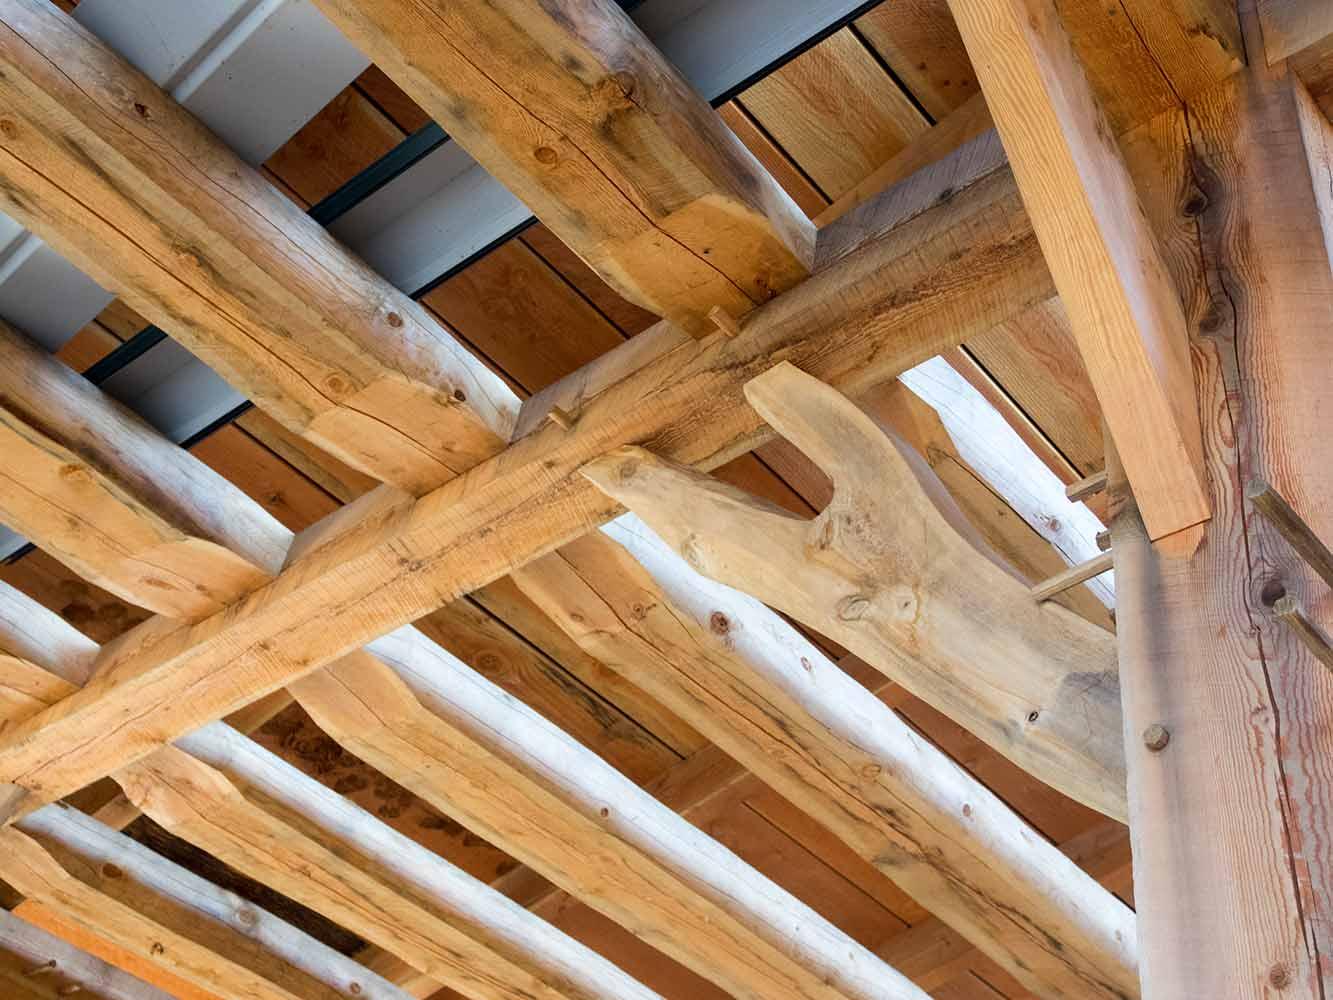 Oregon Timber Frame Barn 2014 | The Shelter Blog